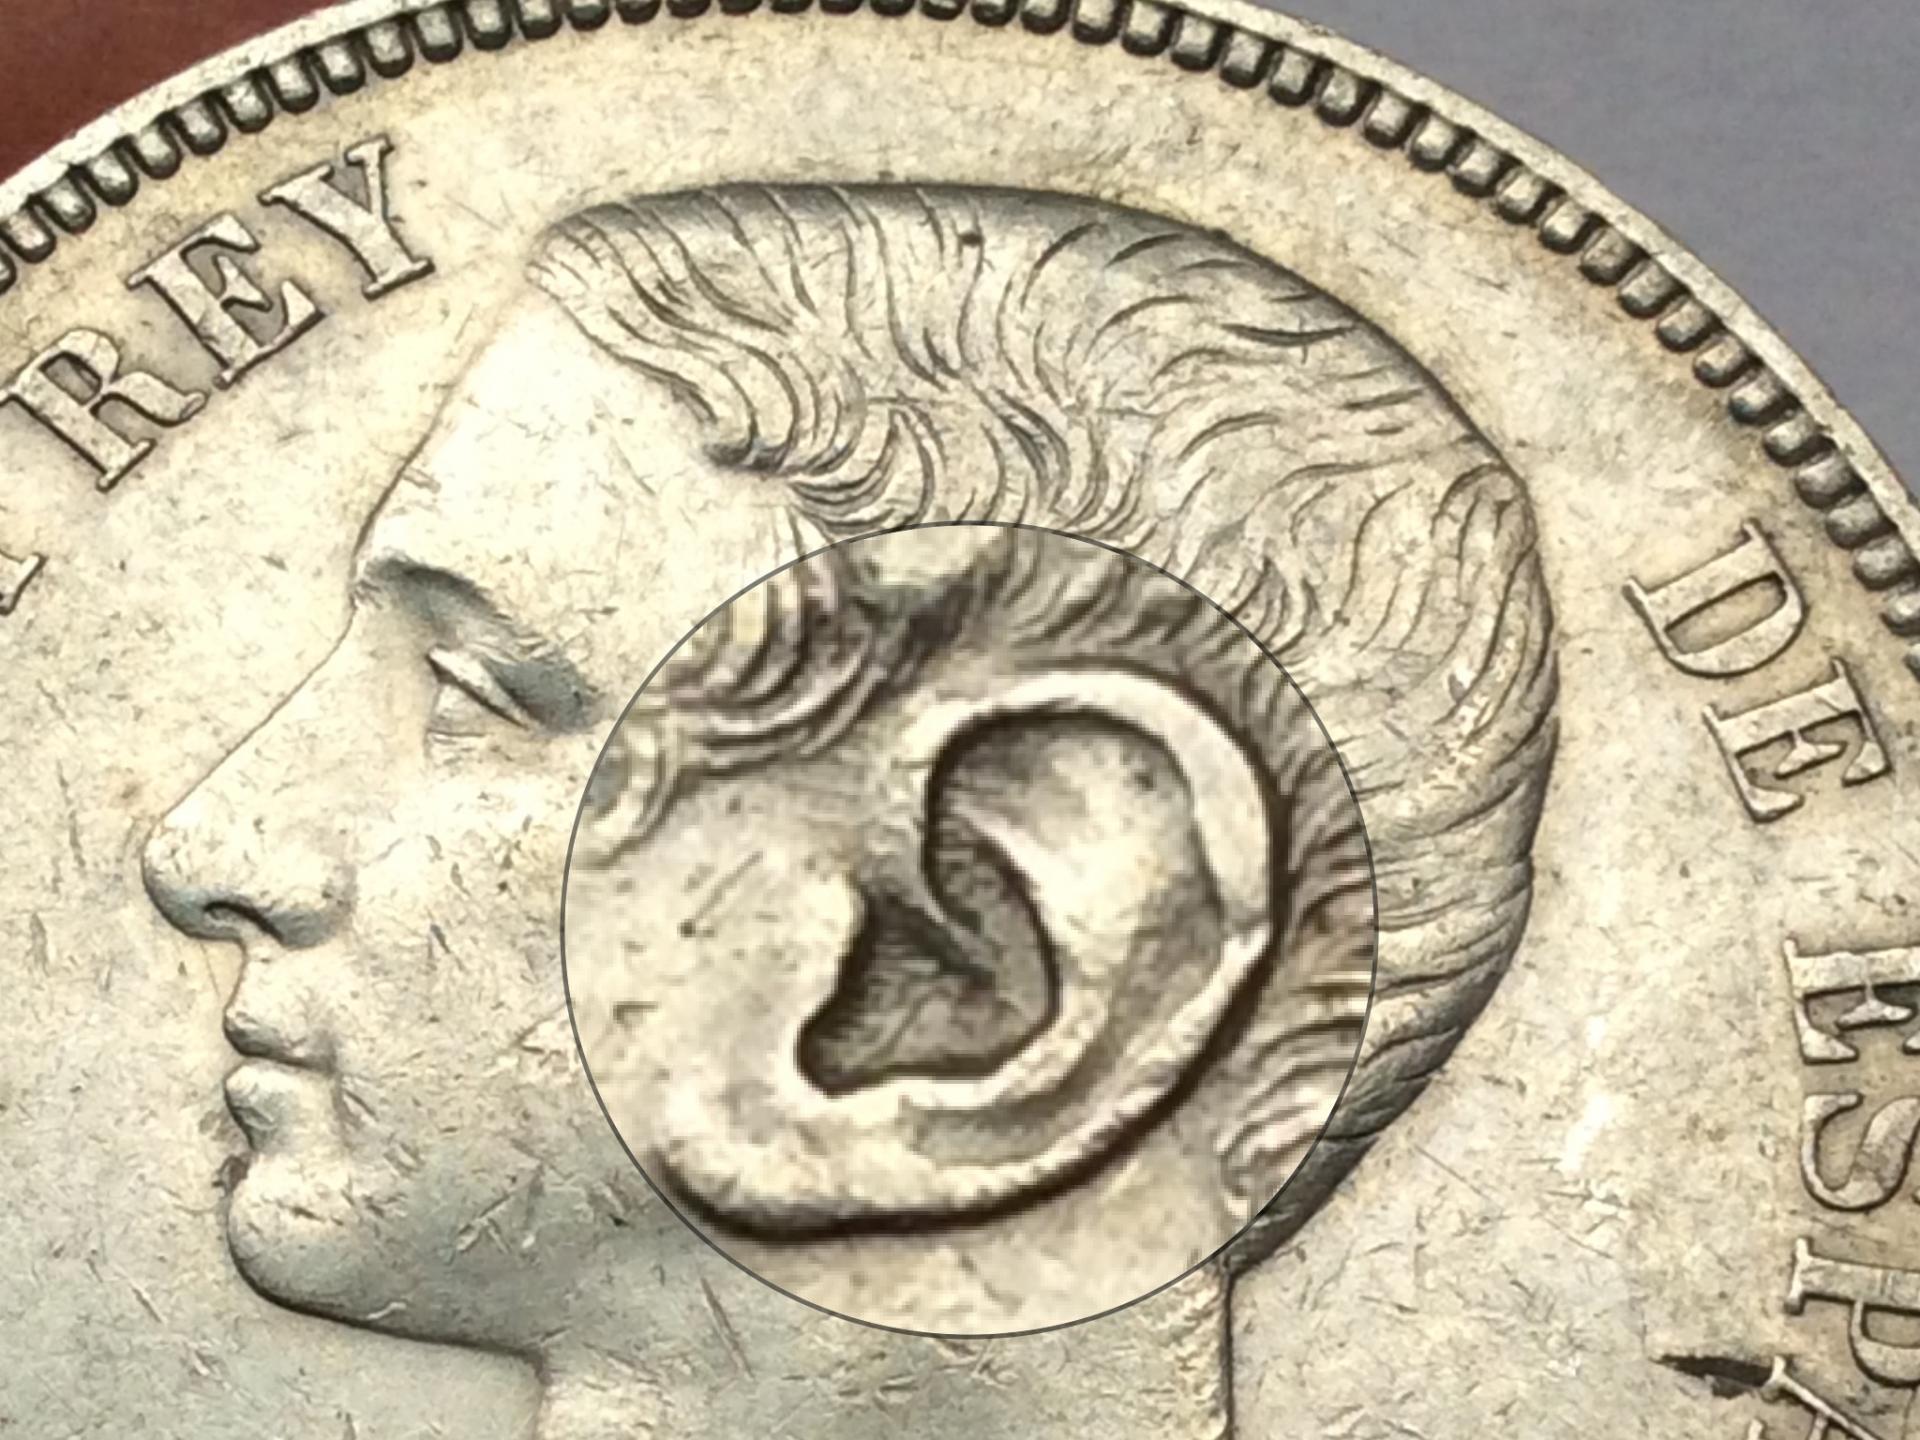 5 PESETAS 1875 *18*75 - ALFONSO XII - VARIANTE OREJA RAYADA